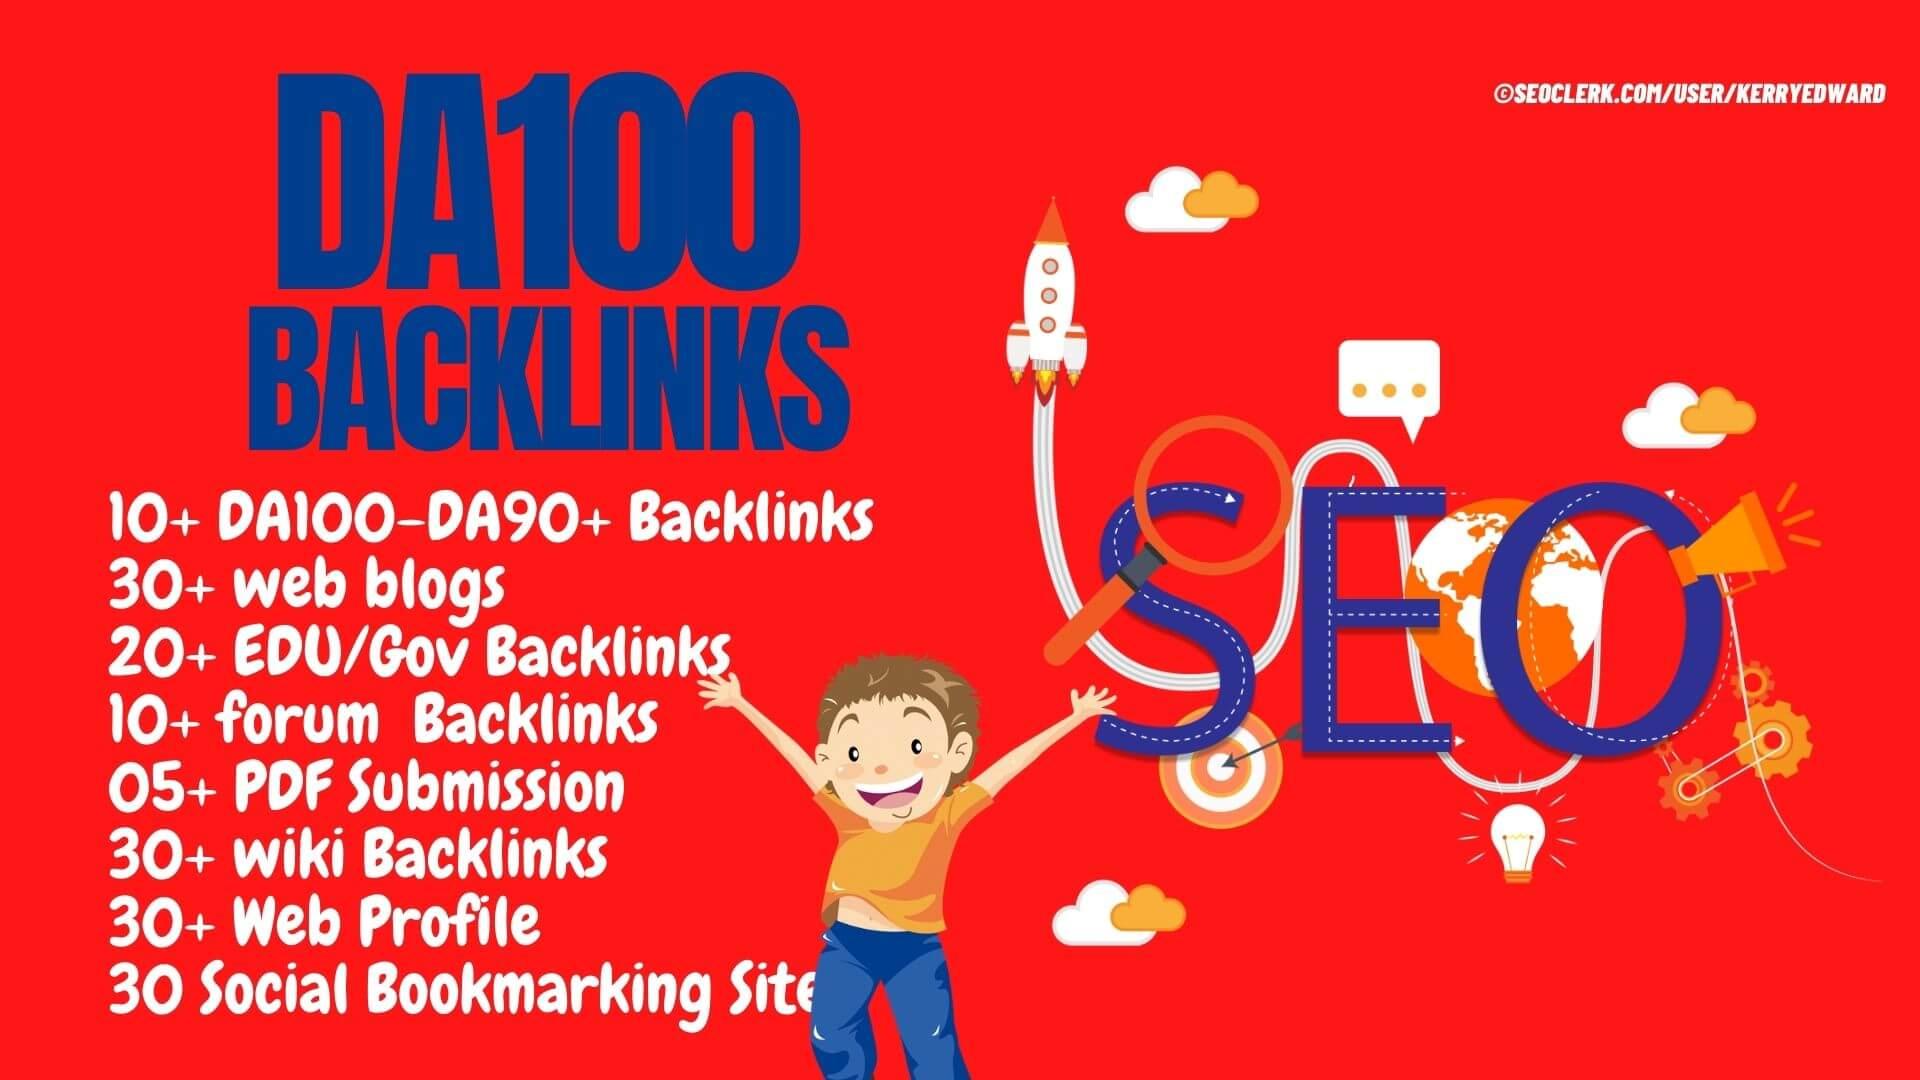 PR10 Backlinks 60 Web,  20 Edu/Gov,  30 Wiki,  30 Web,  30 Social Bookmarking,  10 Forum,  10 DA90+